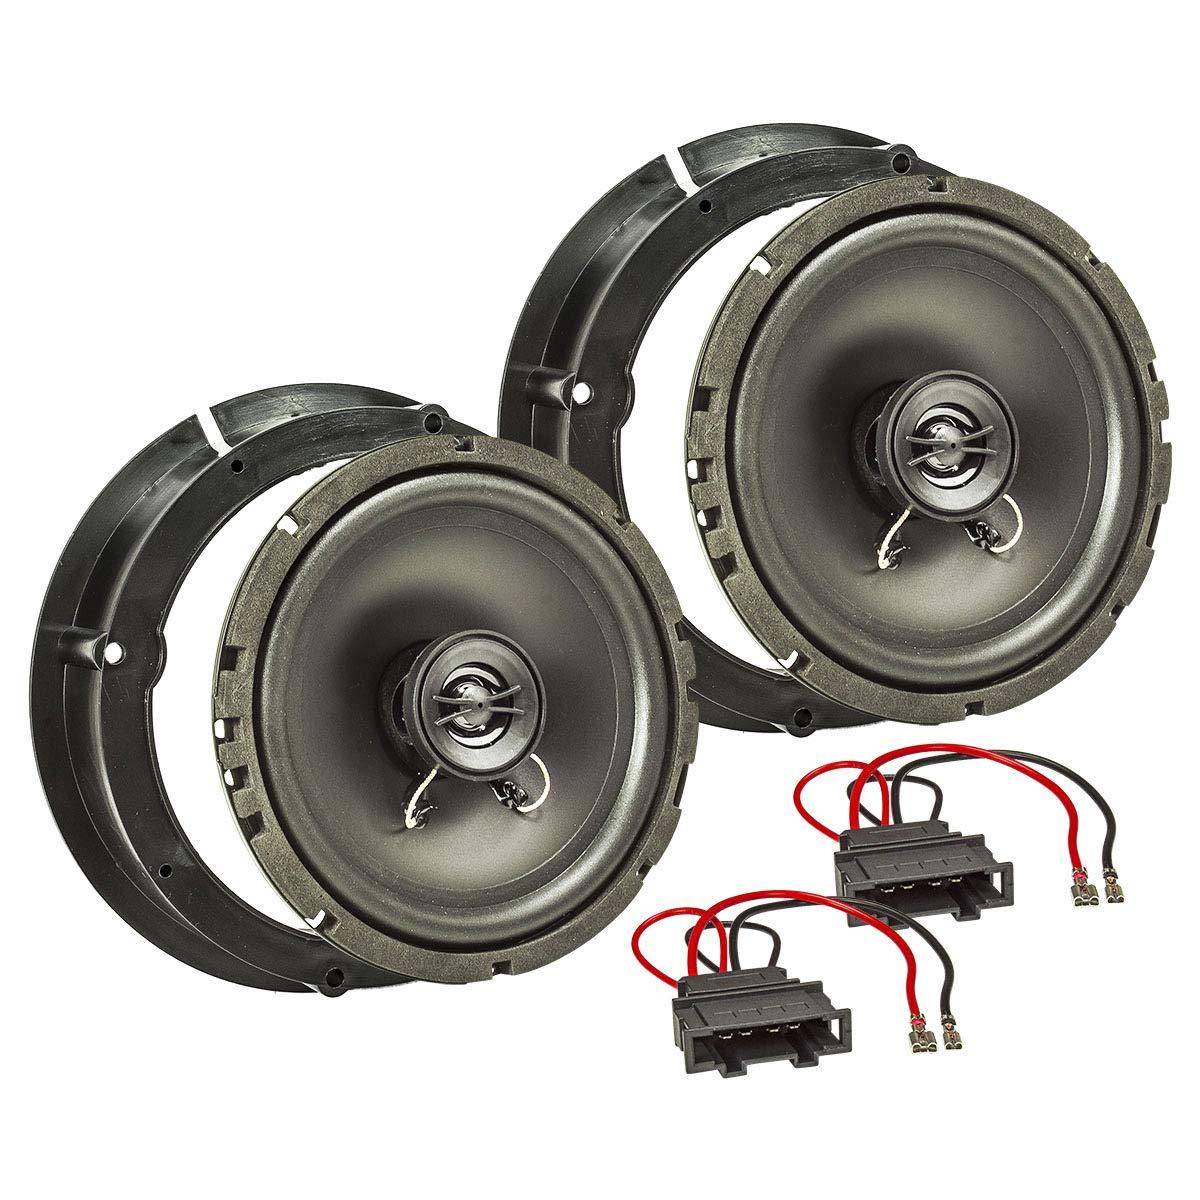 tomzz Audio 4057 – 001 Altavoz Set de instalación para Volkswagen Golf IV, Passat 3BG, Polo 9 N 6R, Beetle 9 C Frontal para Puerta 165 mm